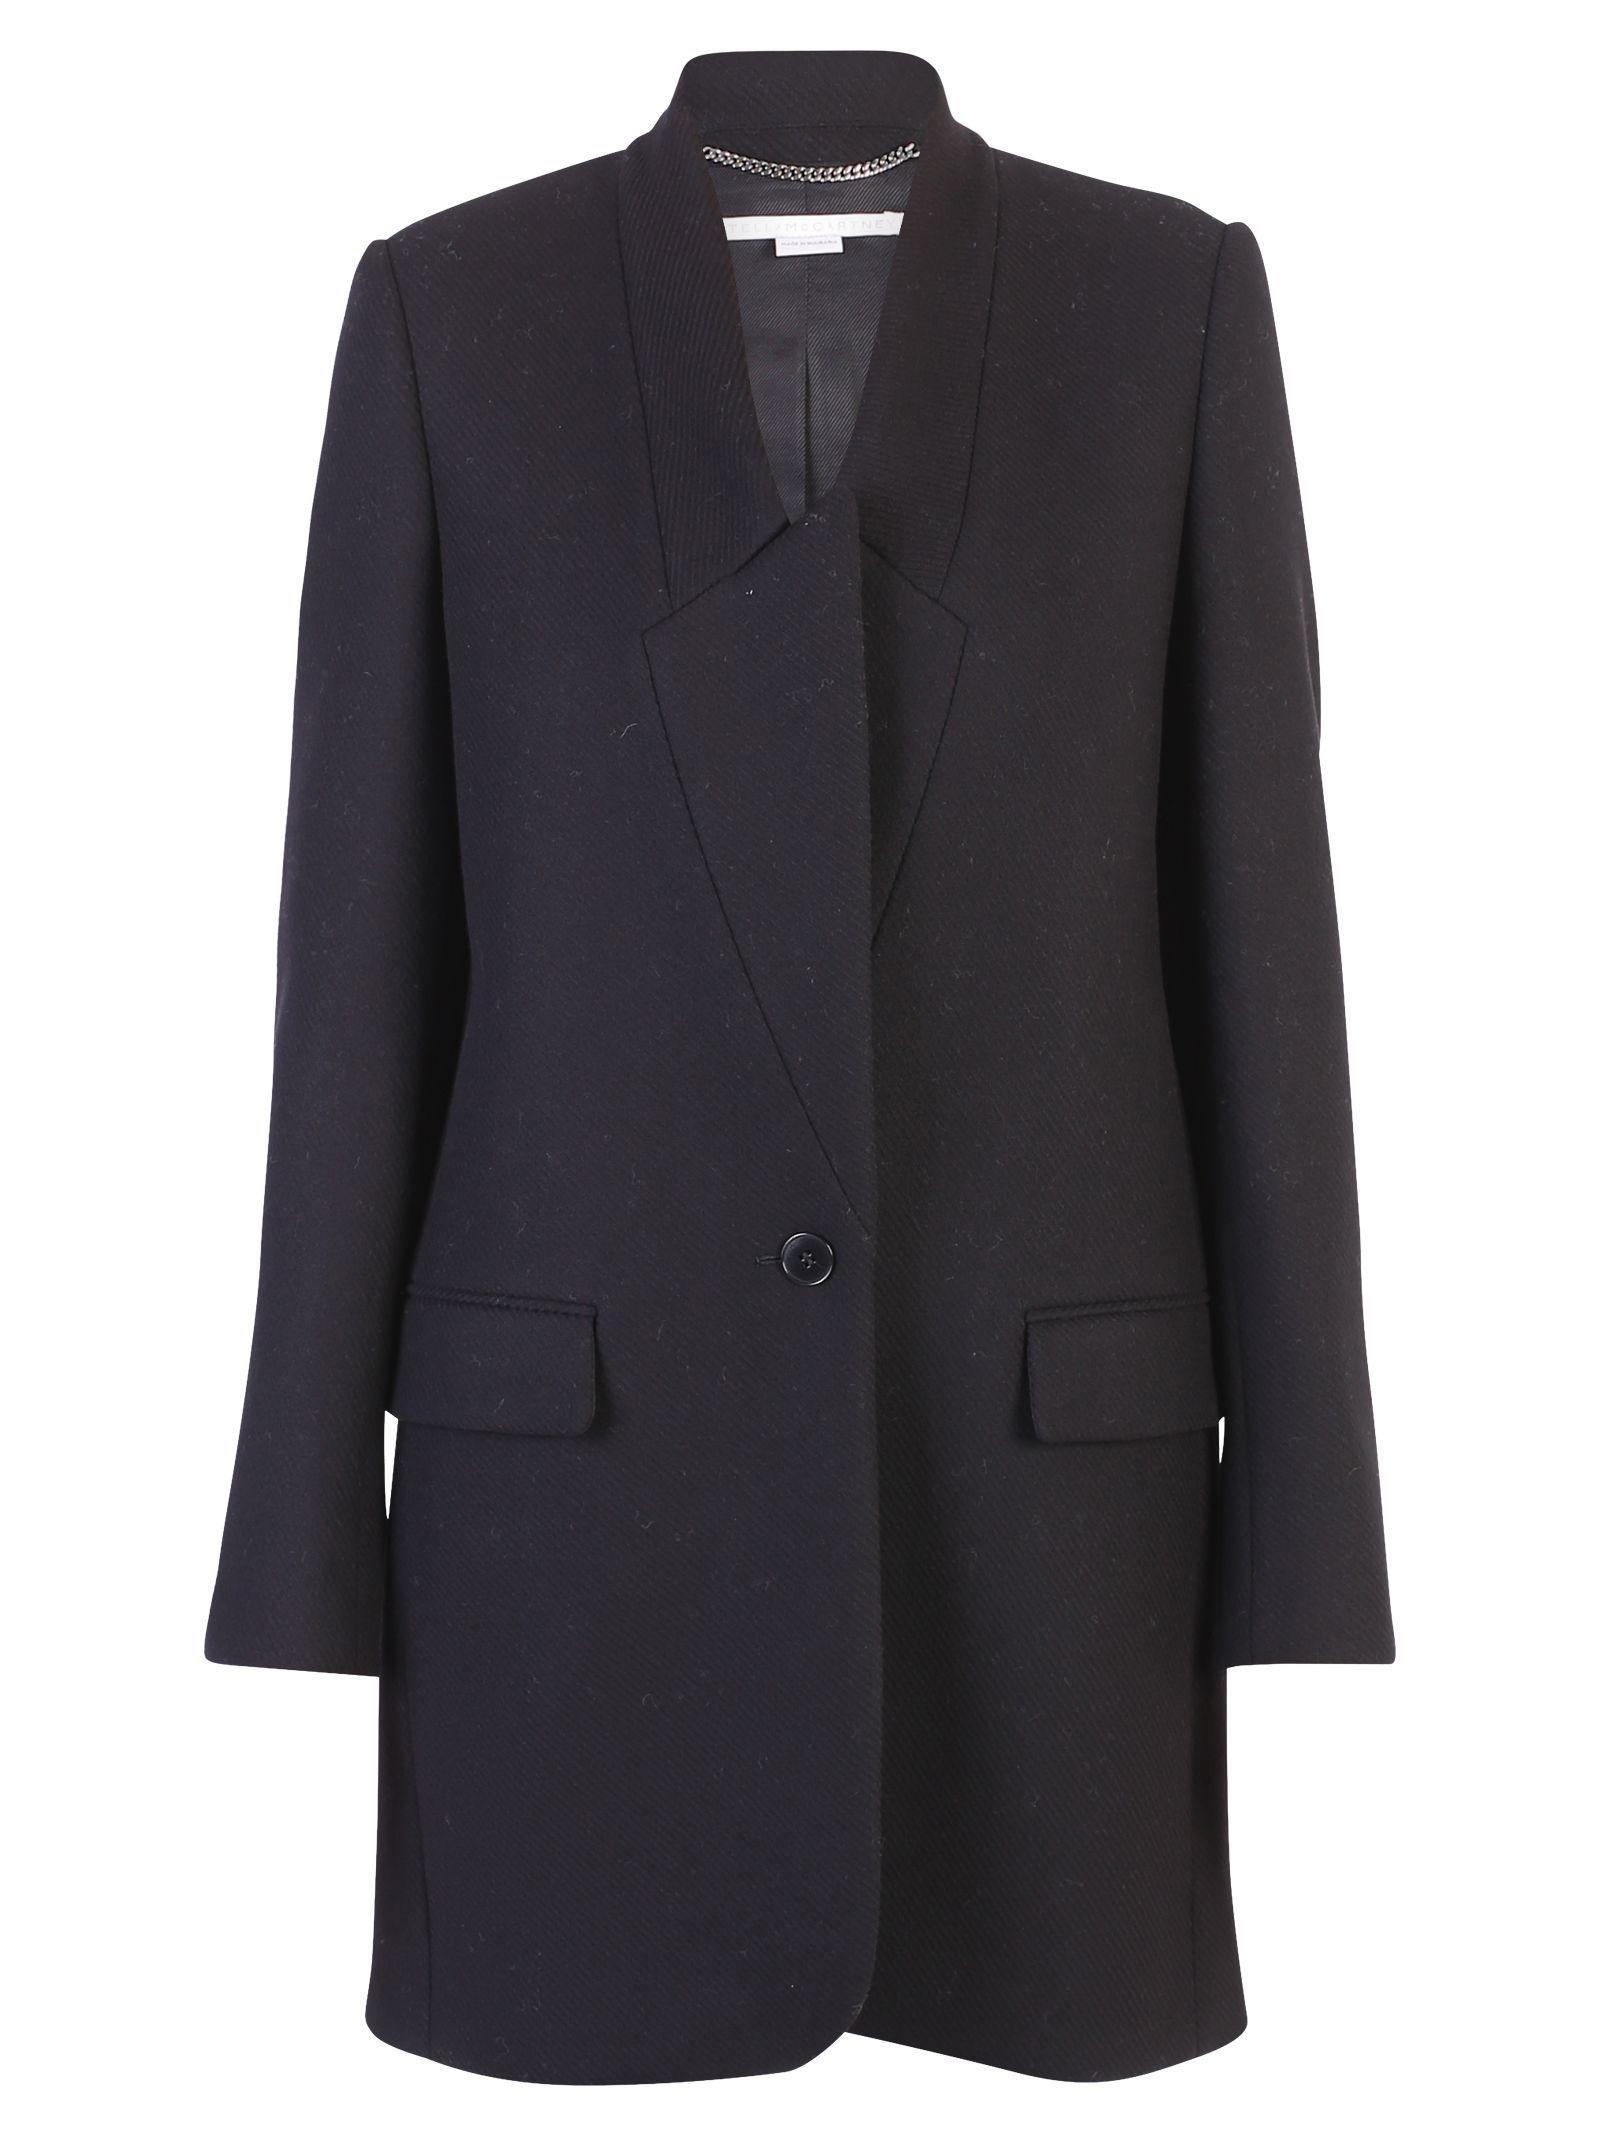 Stella McCartney Black Single Breasted Coat